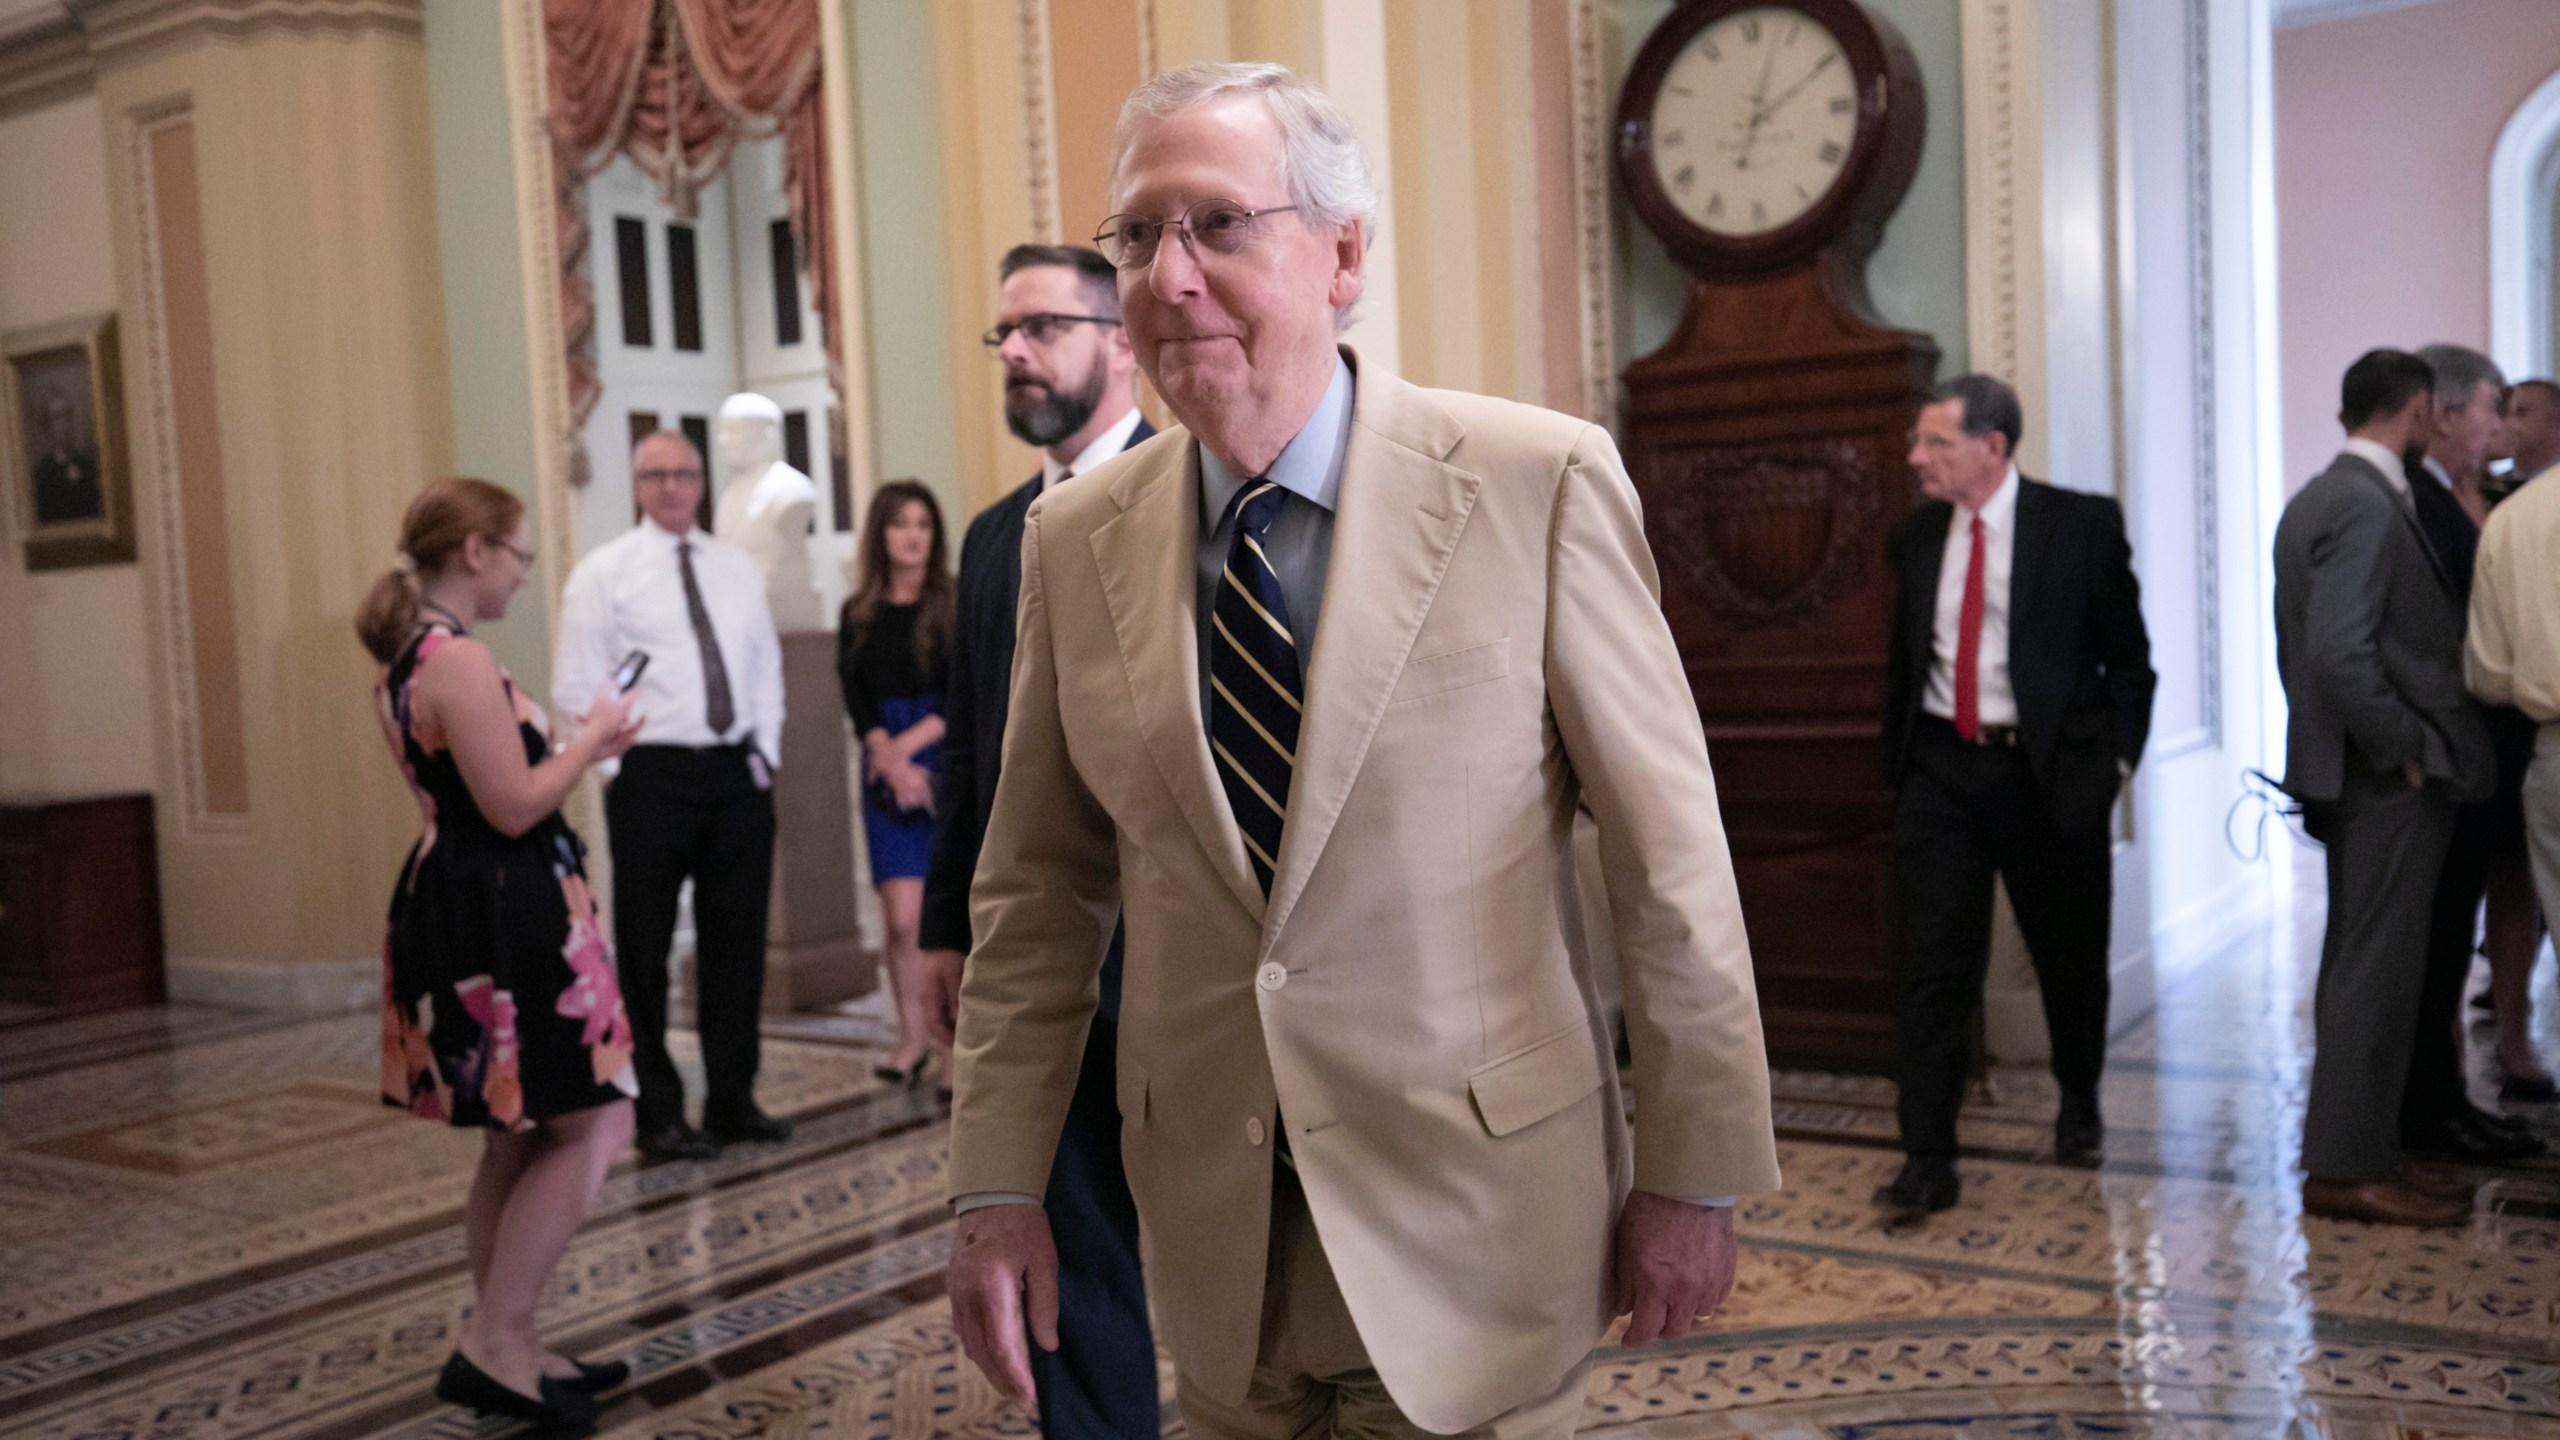 Senate_McConnell_19847-159532.jpg93924732